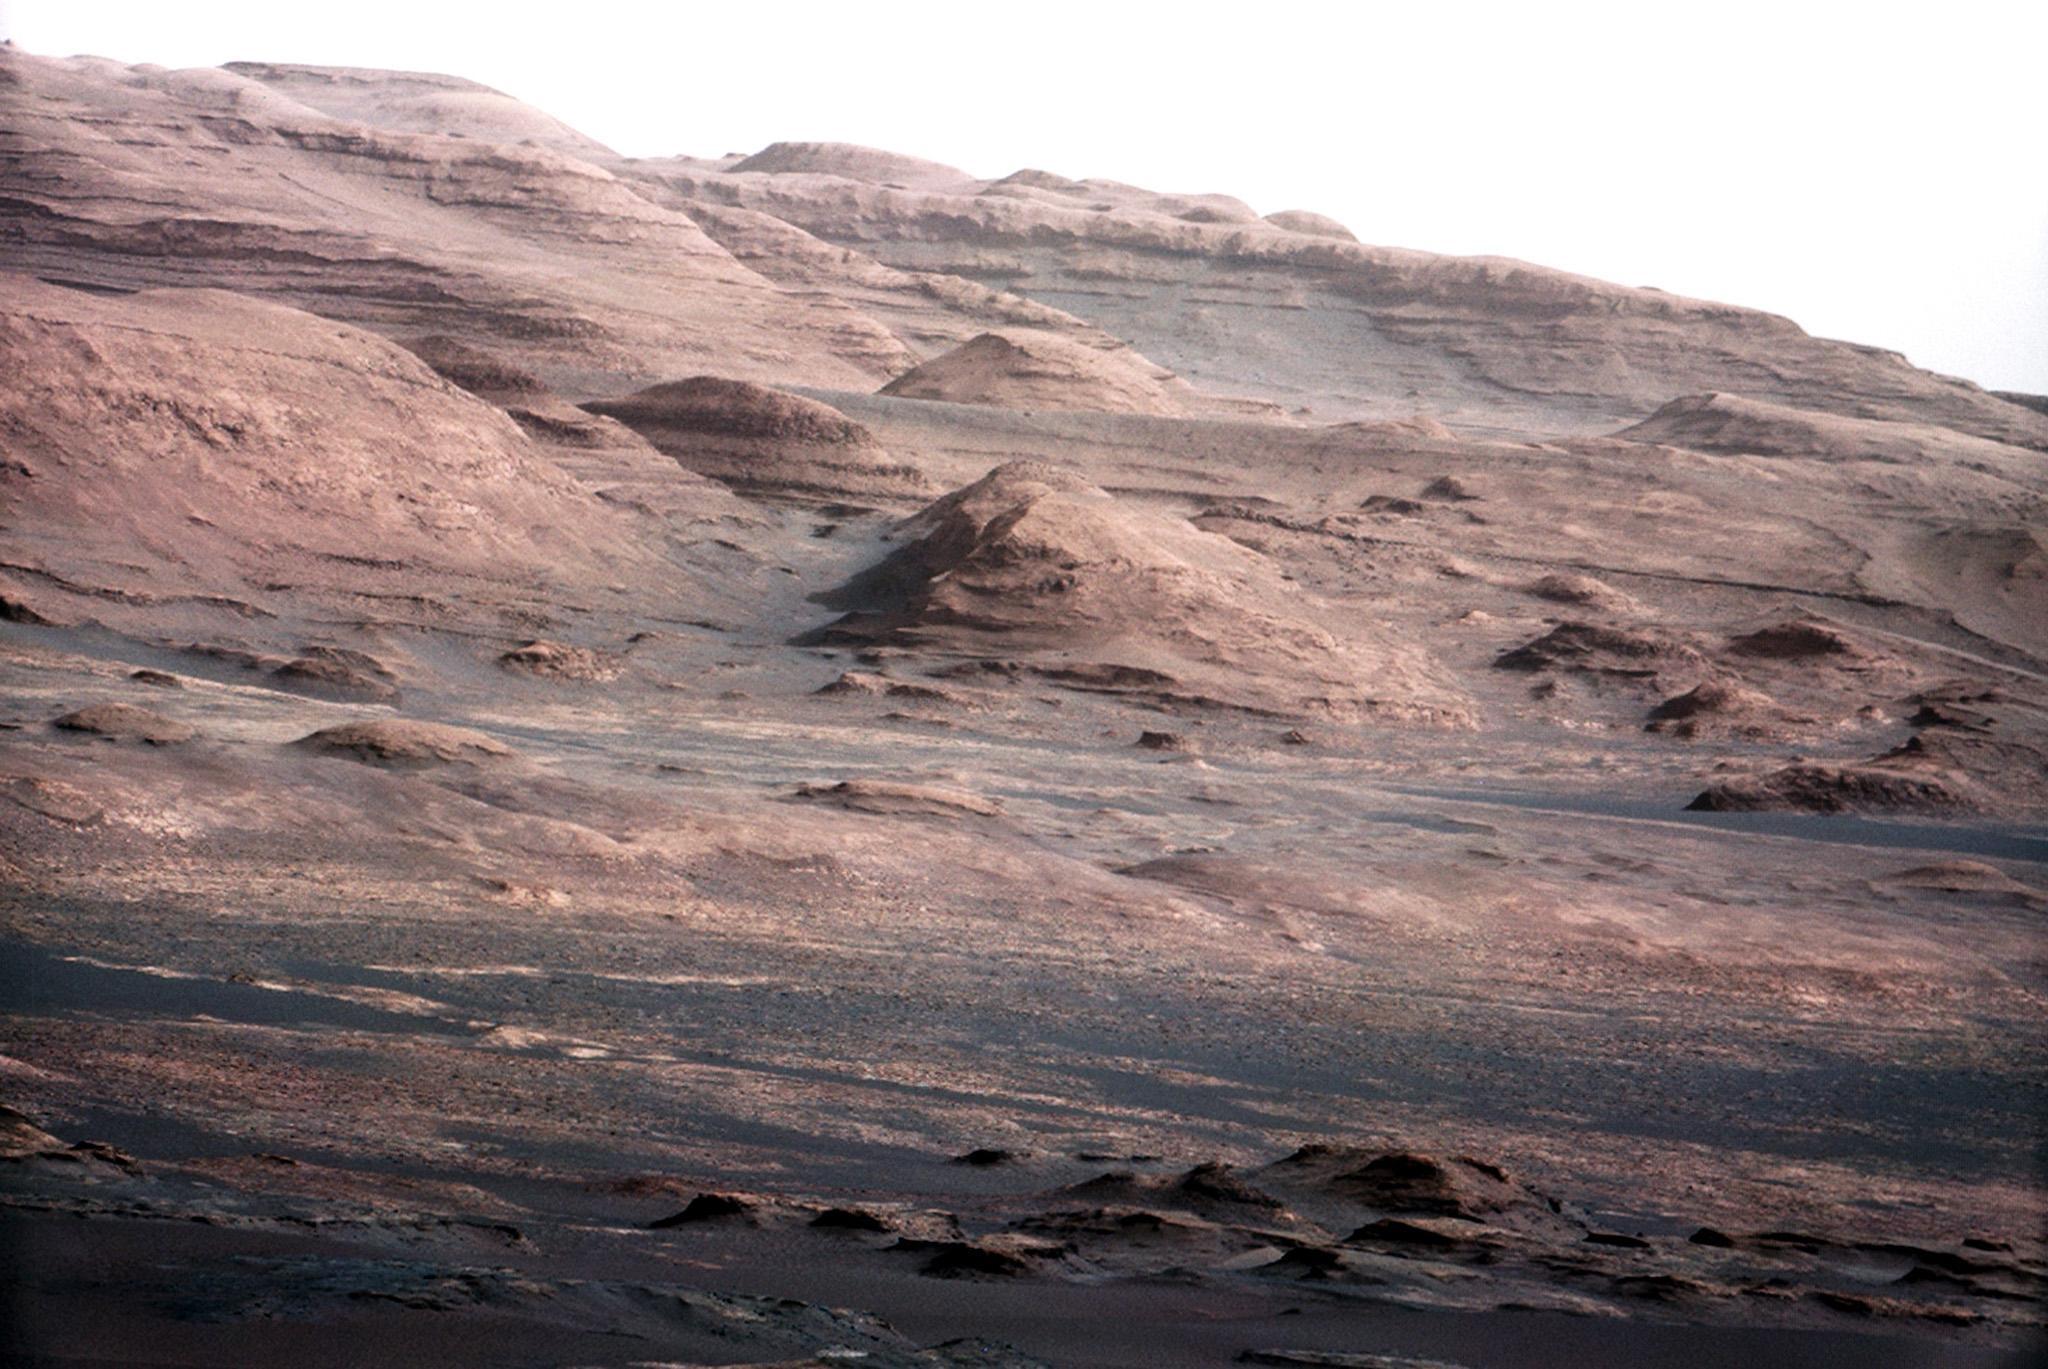 False reports claim Nasa destroyed proof of alien life on Mars